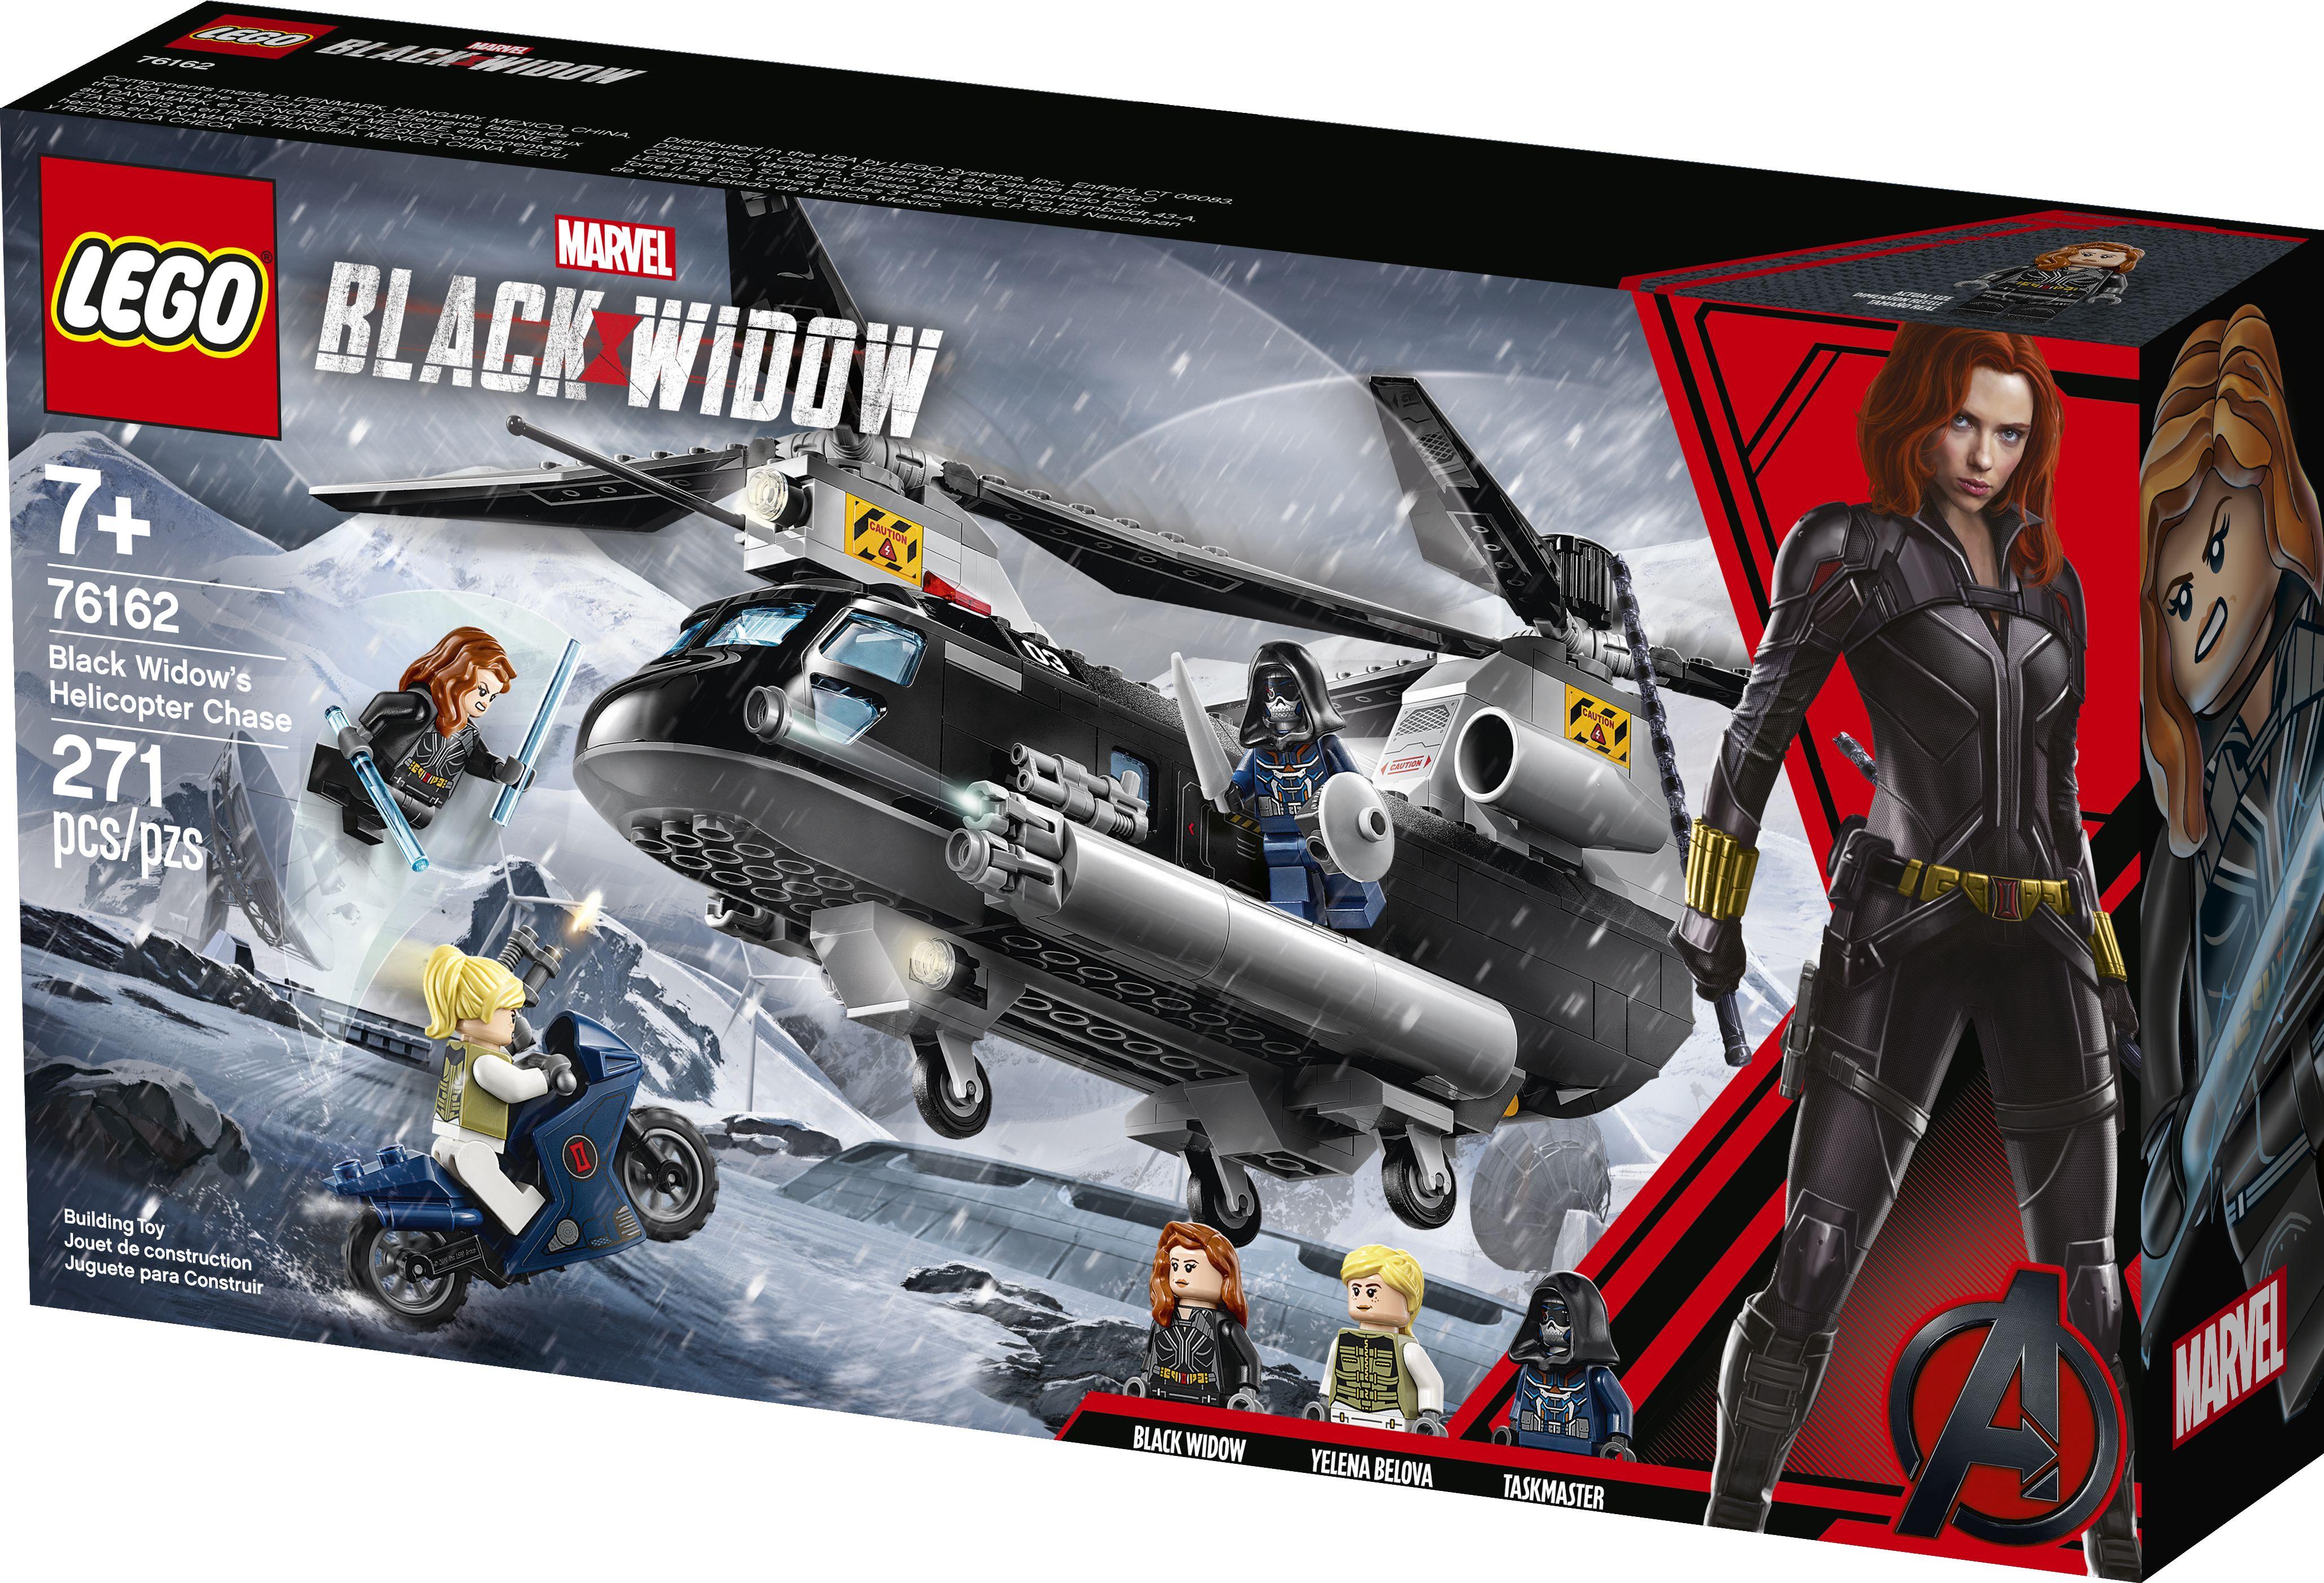 LEGO Marvel Black Widow Yelena Belova figure from set 76162 NEW